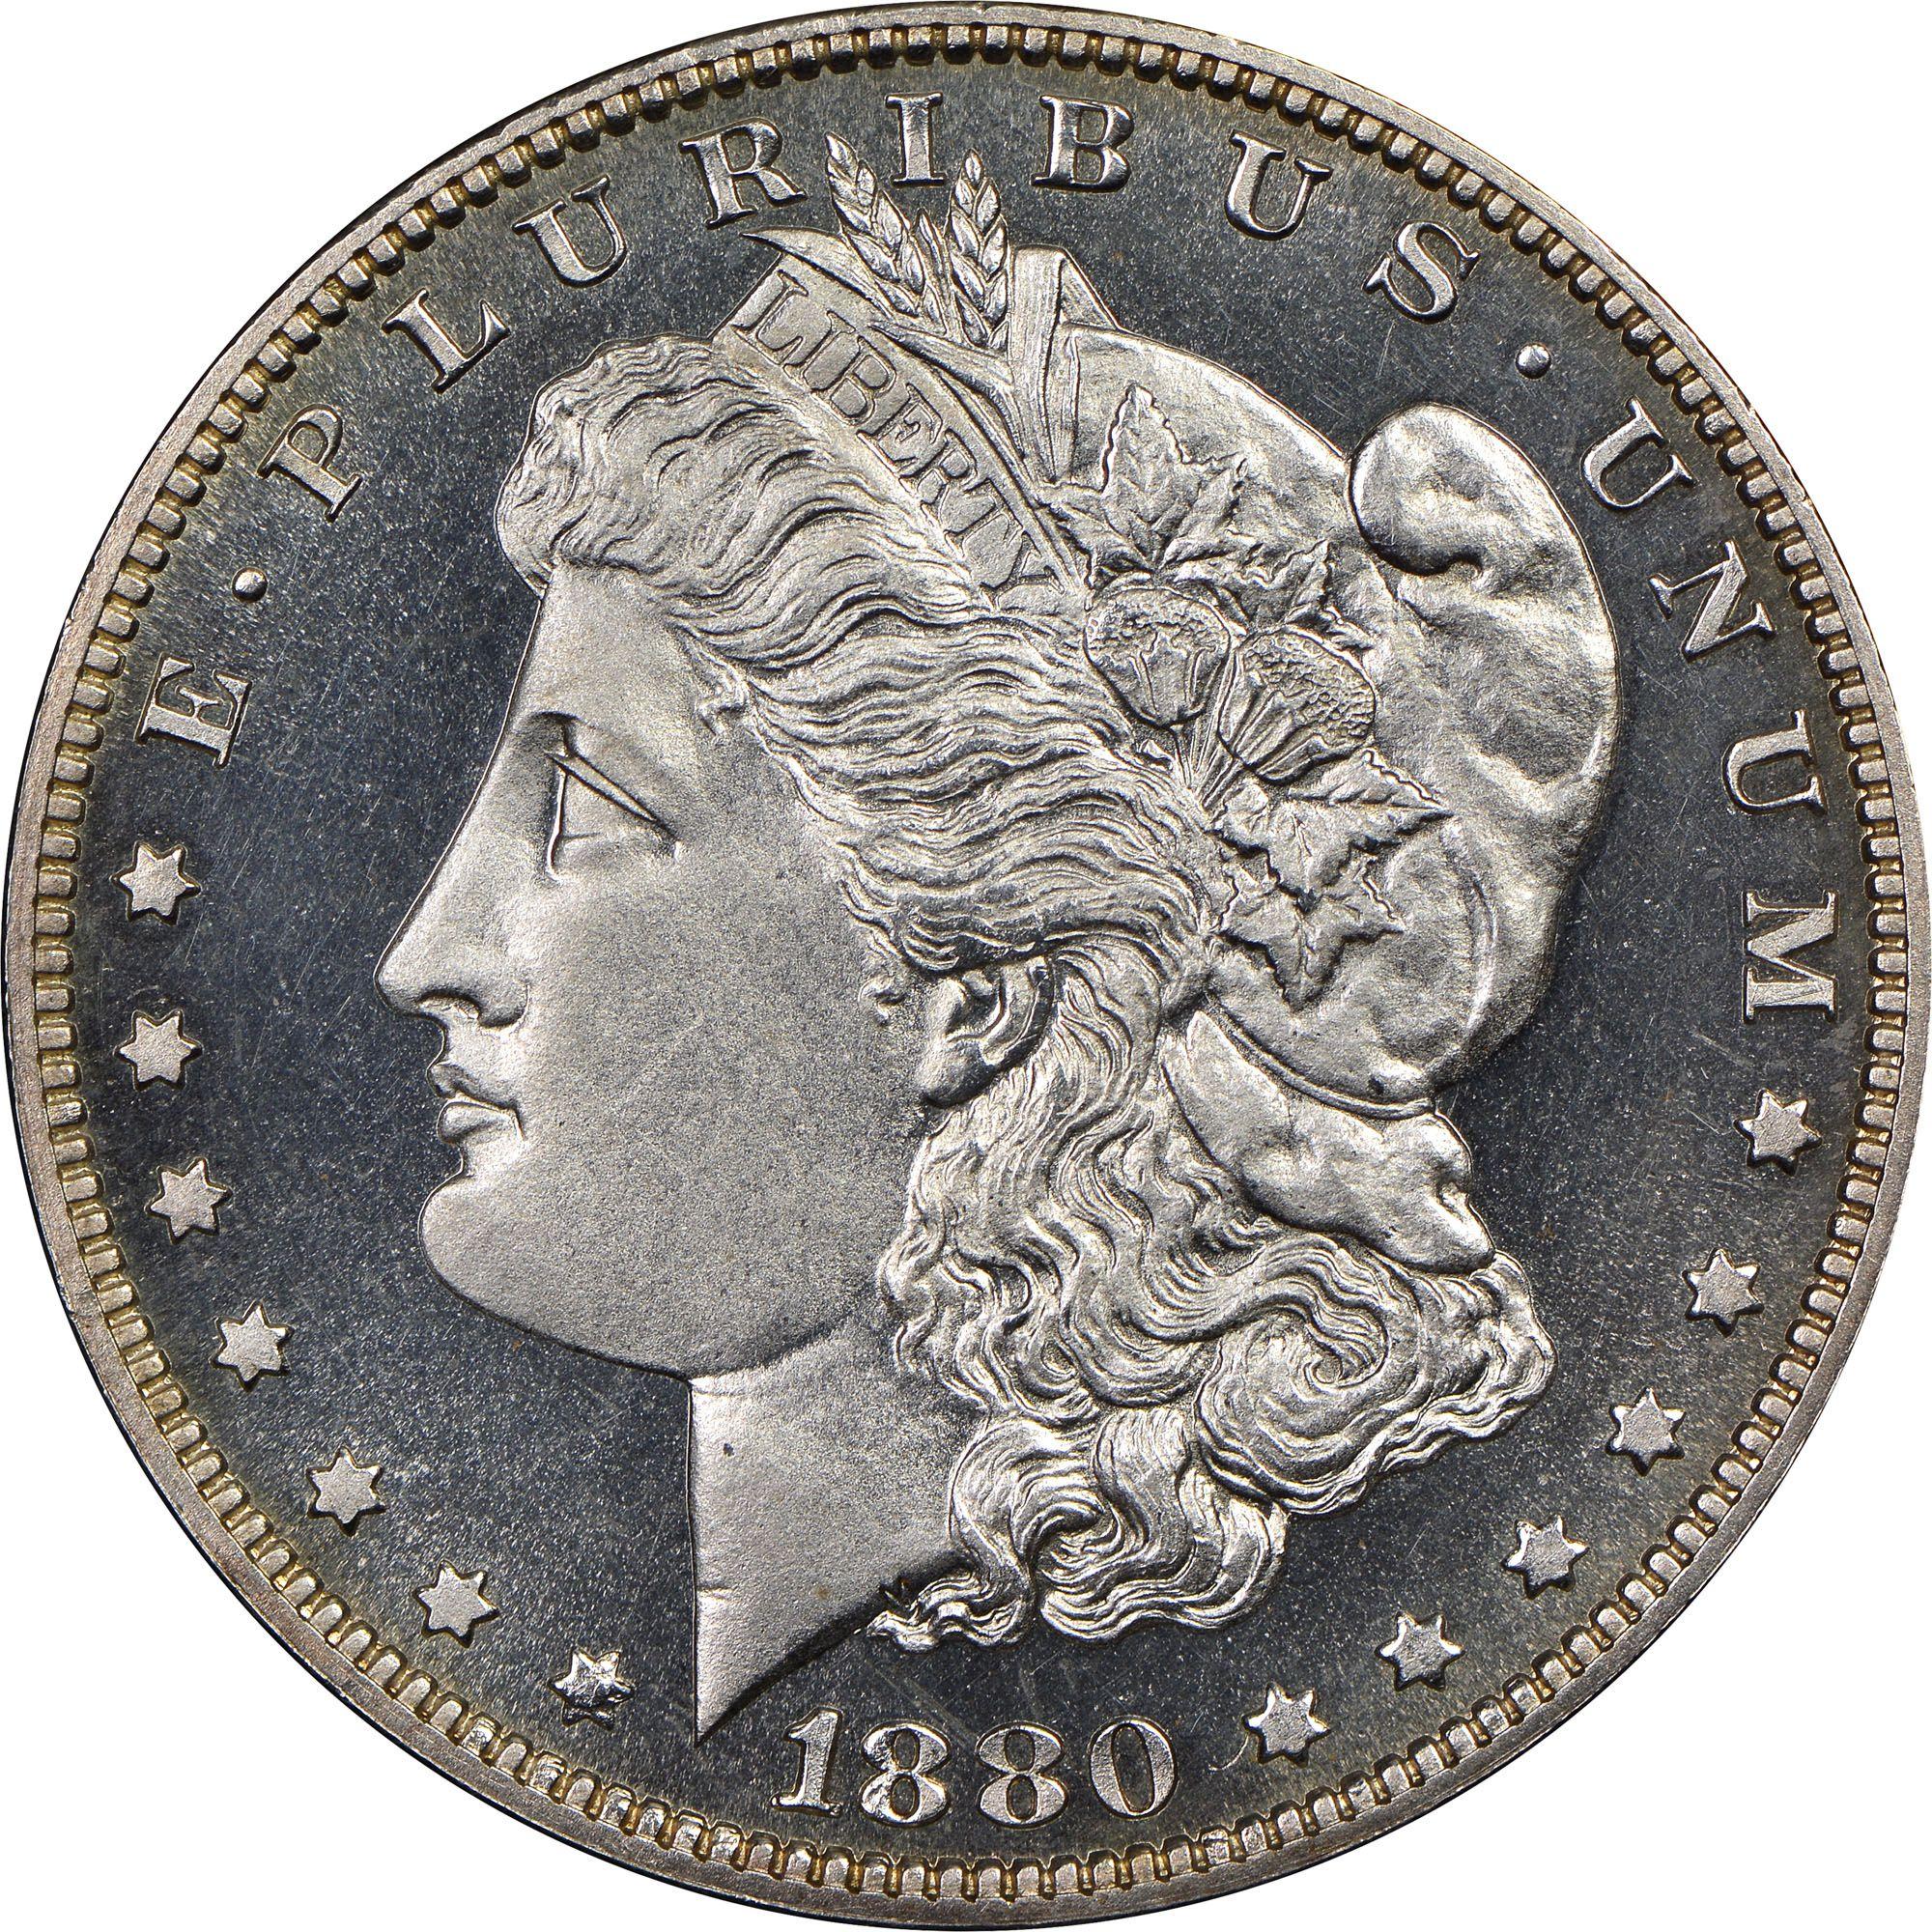 1880 S 1 Pf Https Www Ngccoin Com Coin Explorer Morgan Dollars 1878 1921 Pscid 49 1880 S1 Pf Coinid 17315 Morgan Dollars Coins Old Coins